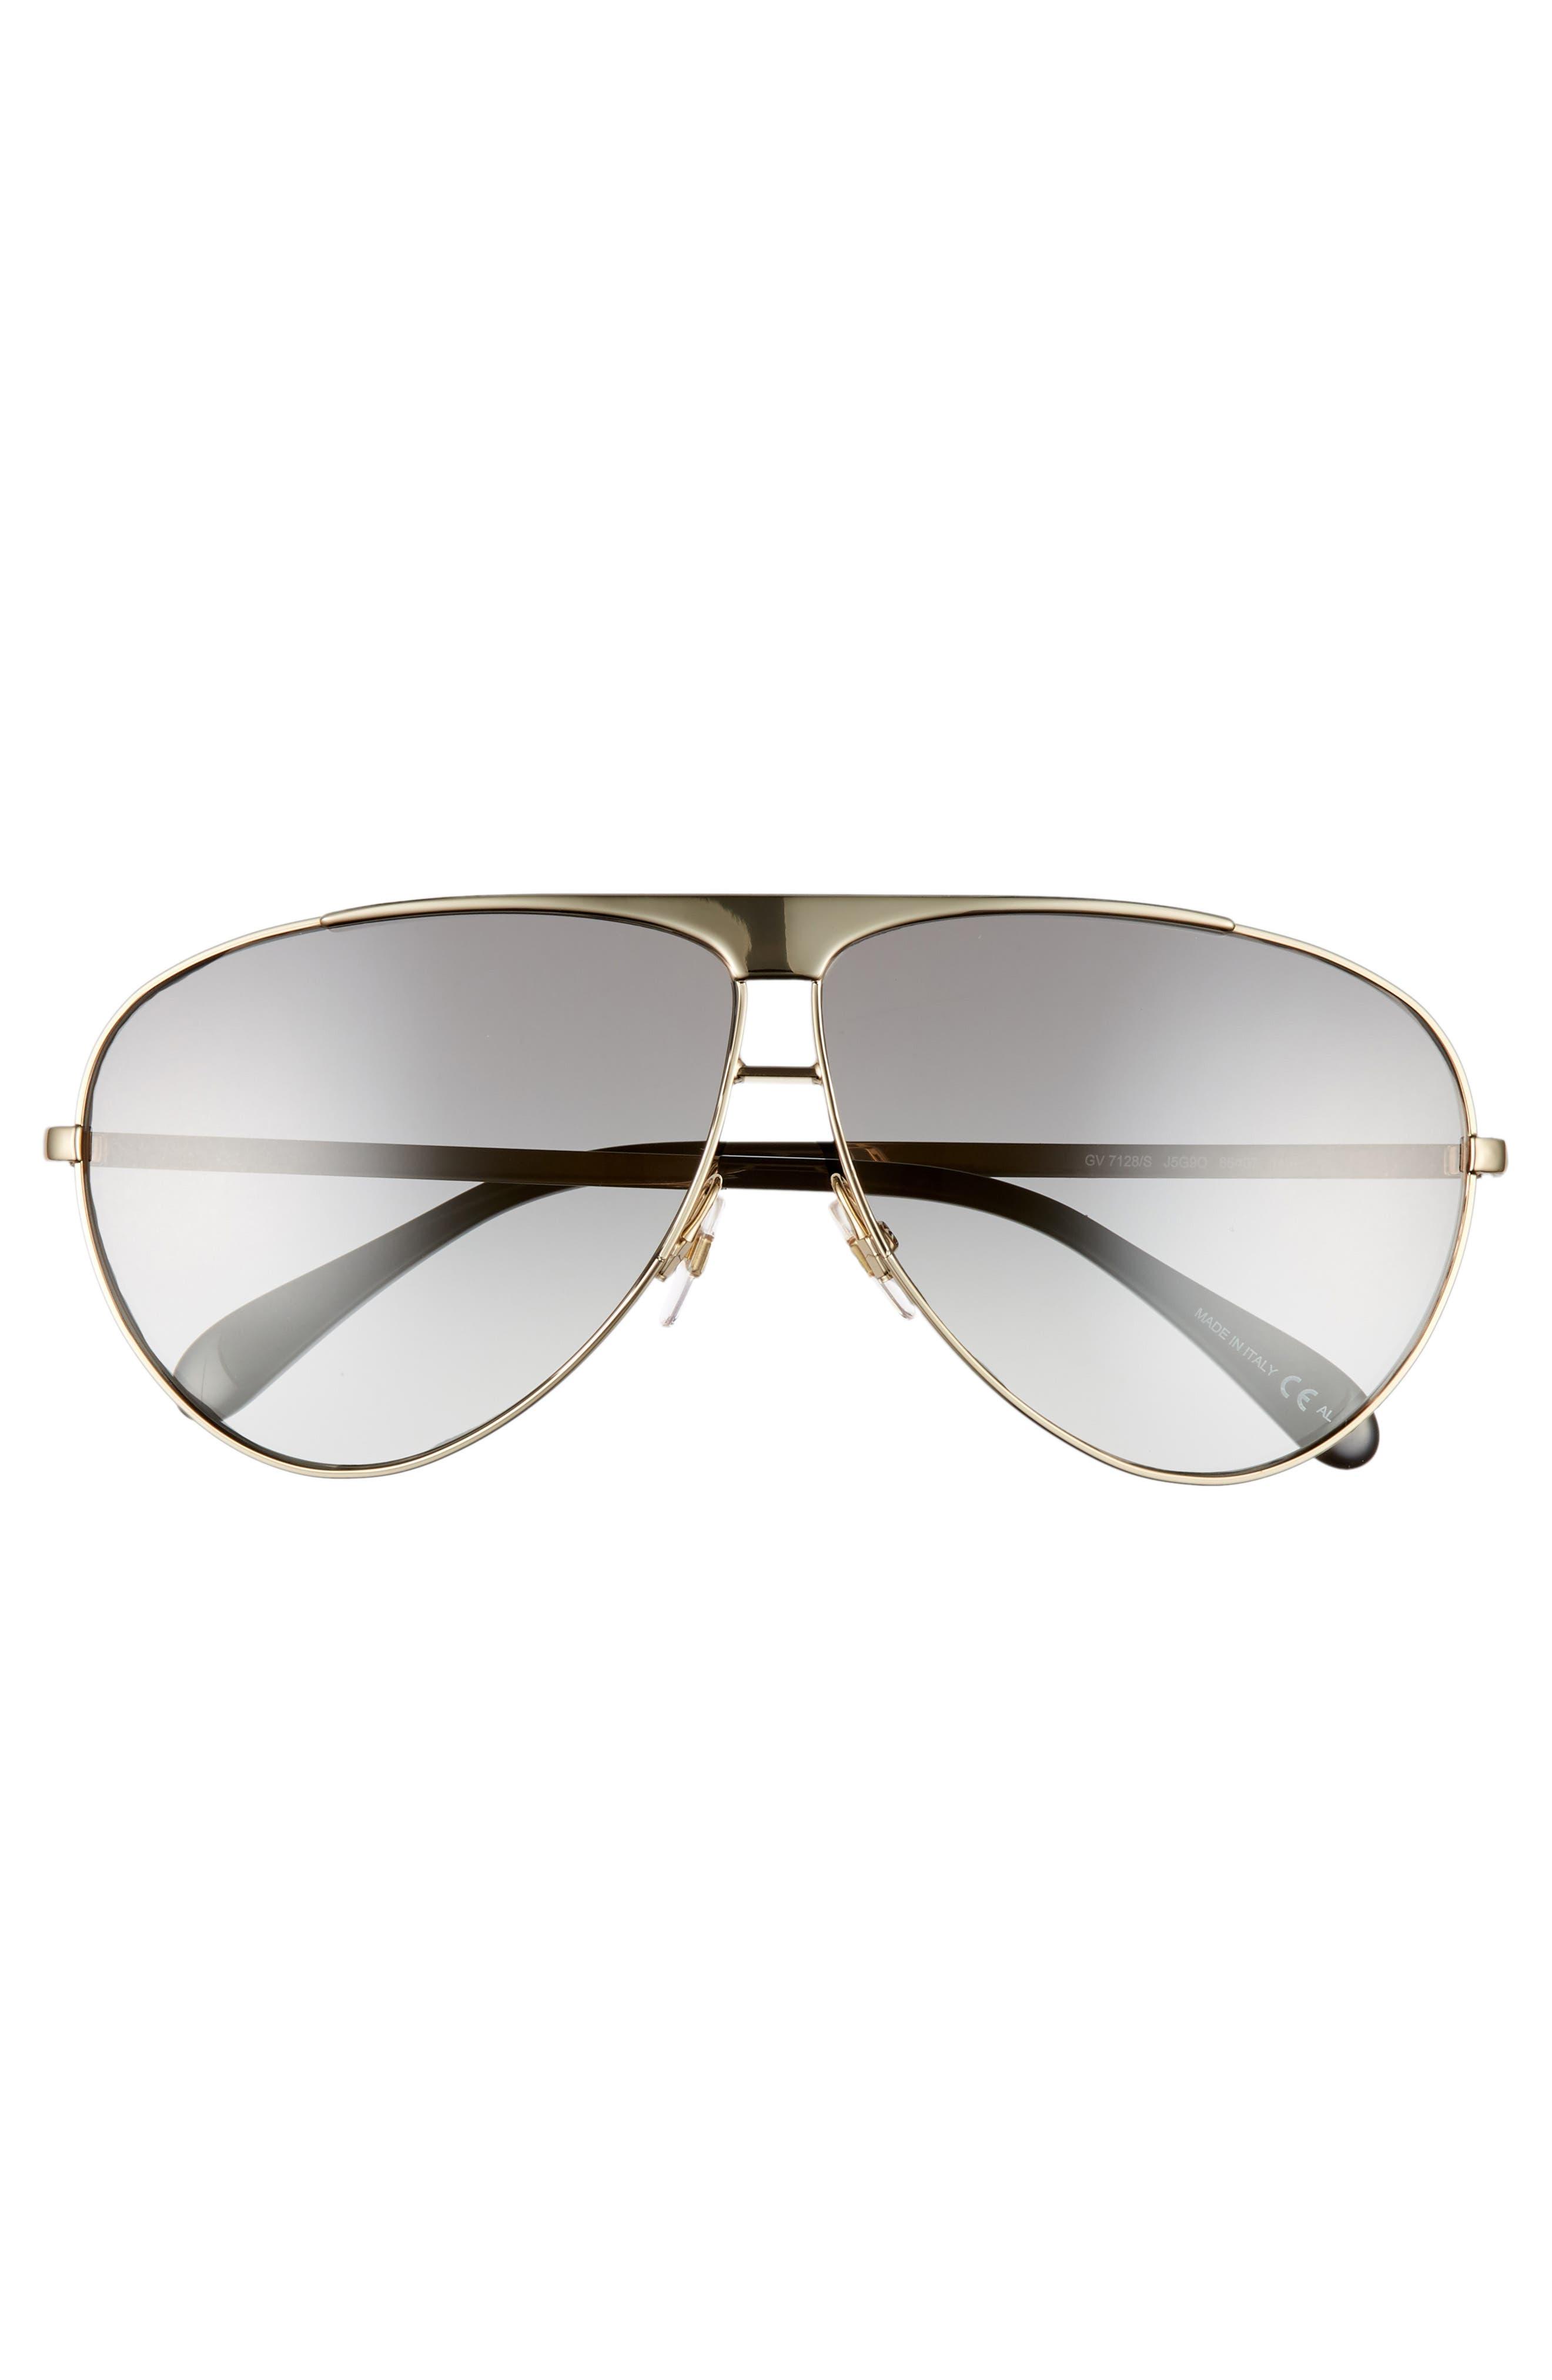 66mm Aviator Sunglasses,                             Alternate thumbnail 3, color,                             710